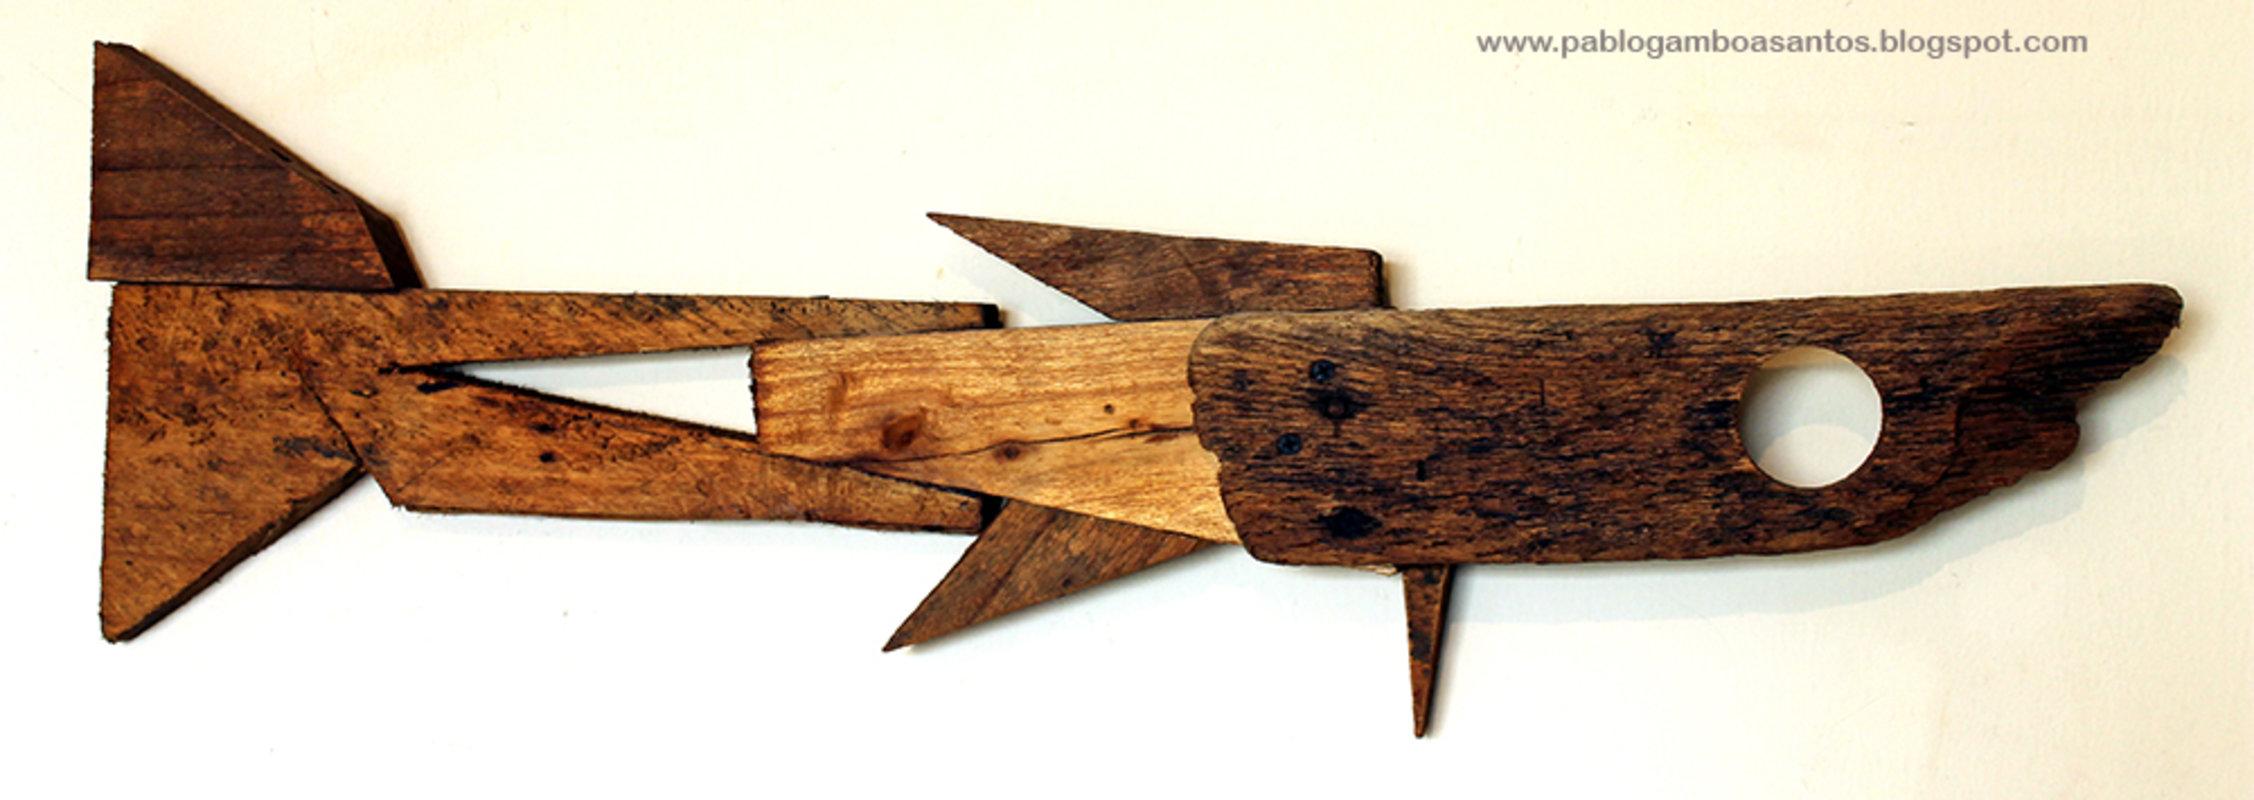 Gamboa Pablo / fish 2 | Gamboa Pablo